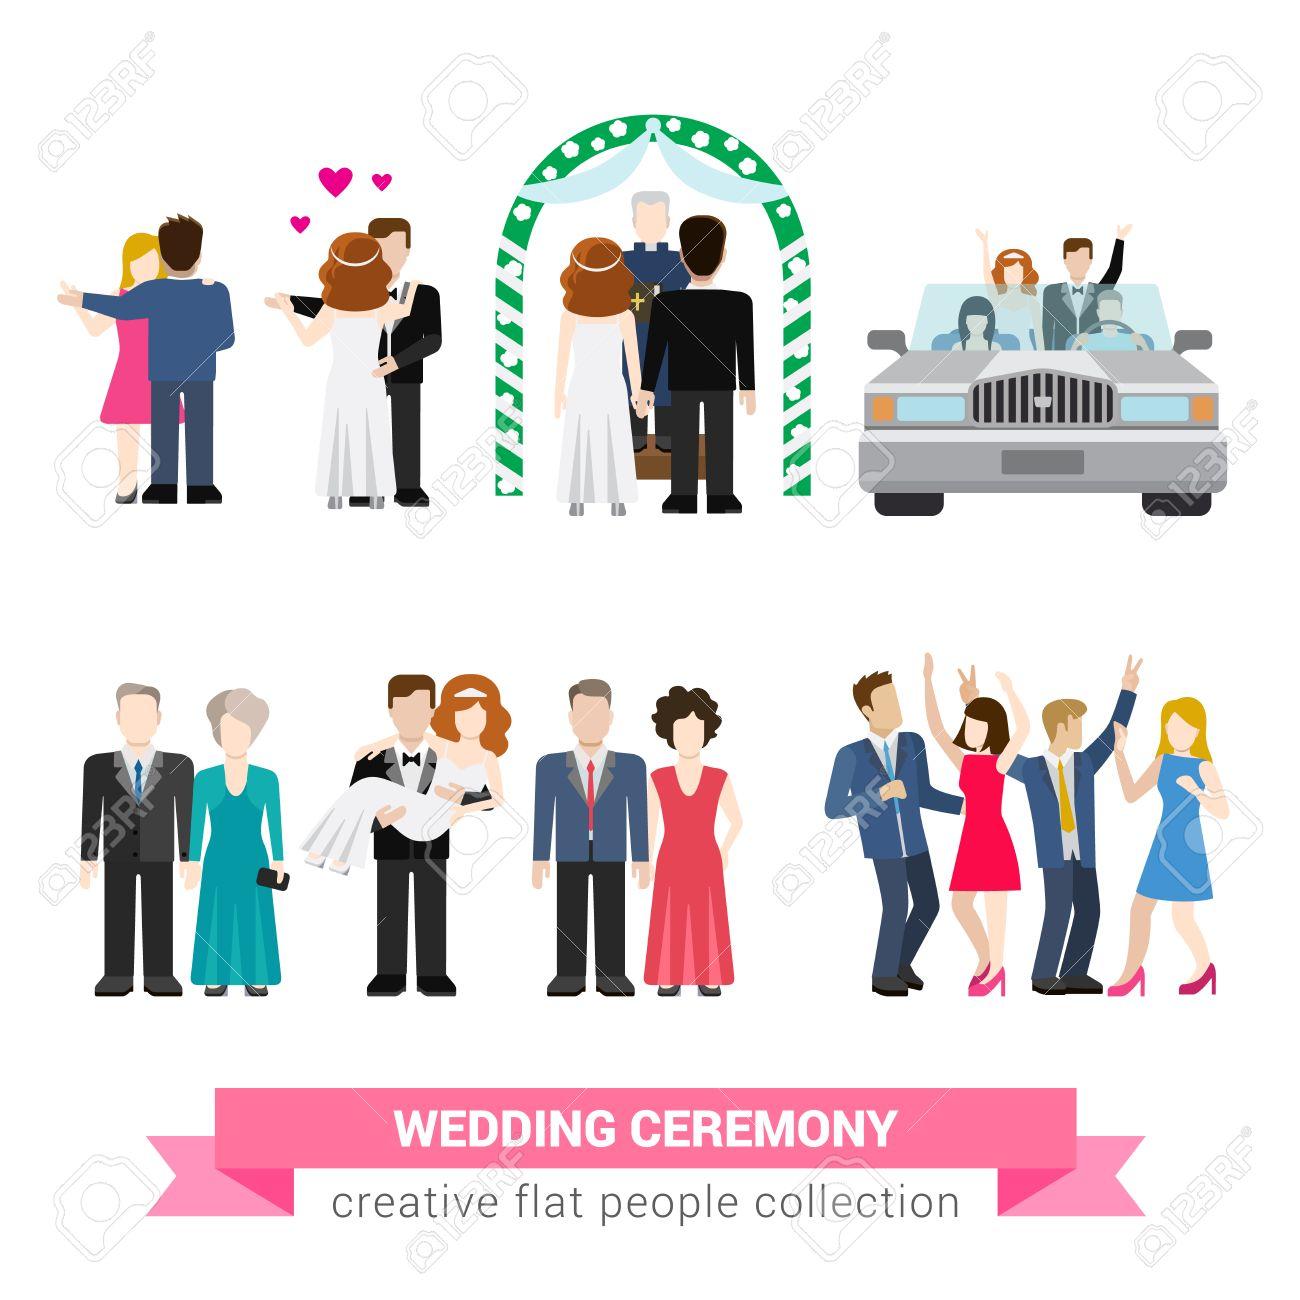 Super wedding ceremony marriage flat style infographic icon people set. Newlyweds wife husband bride groom dance guests groomsman bridesman usher honeymoon. Creative conceptual illustration collection - 54534869